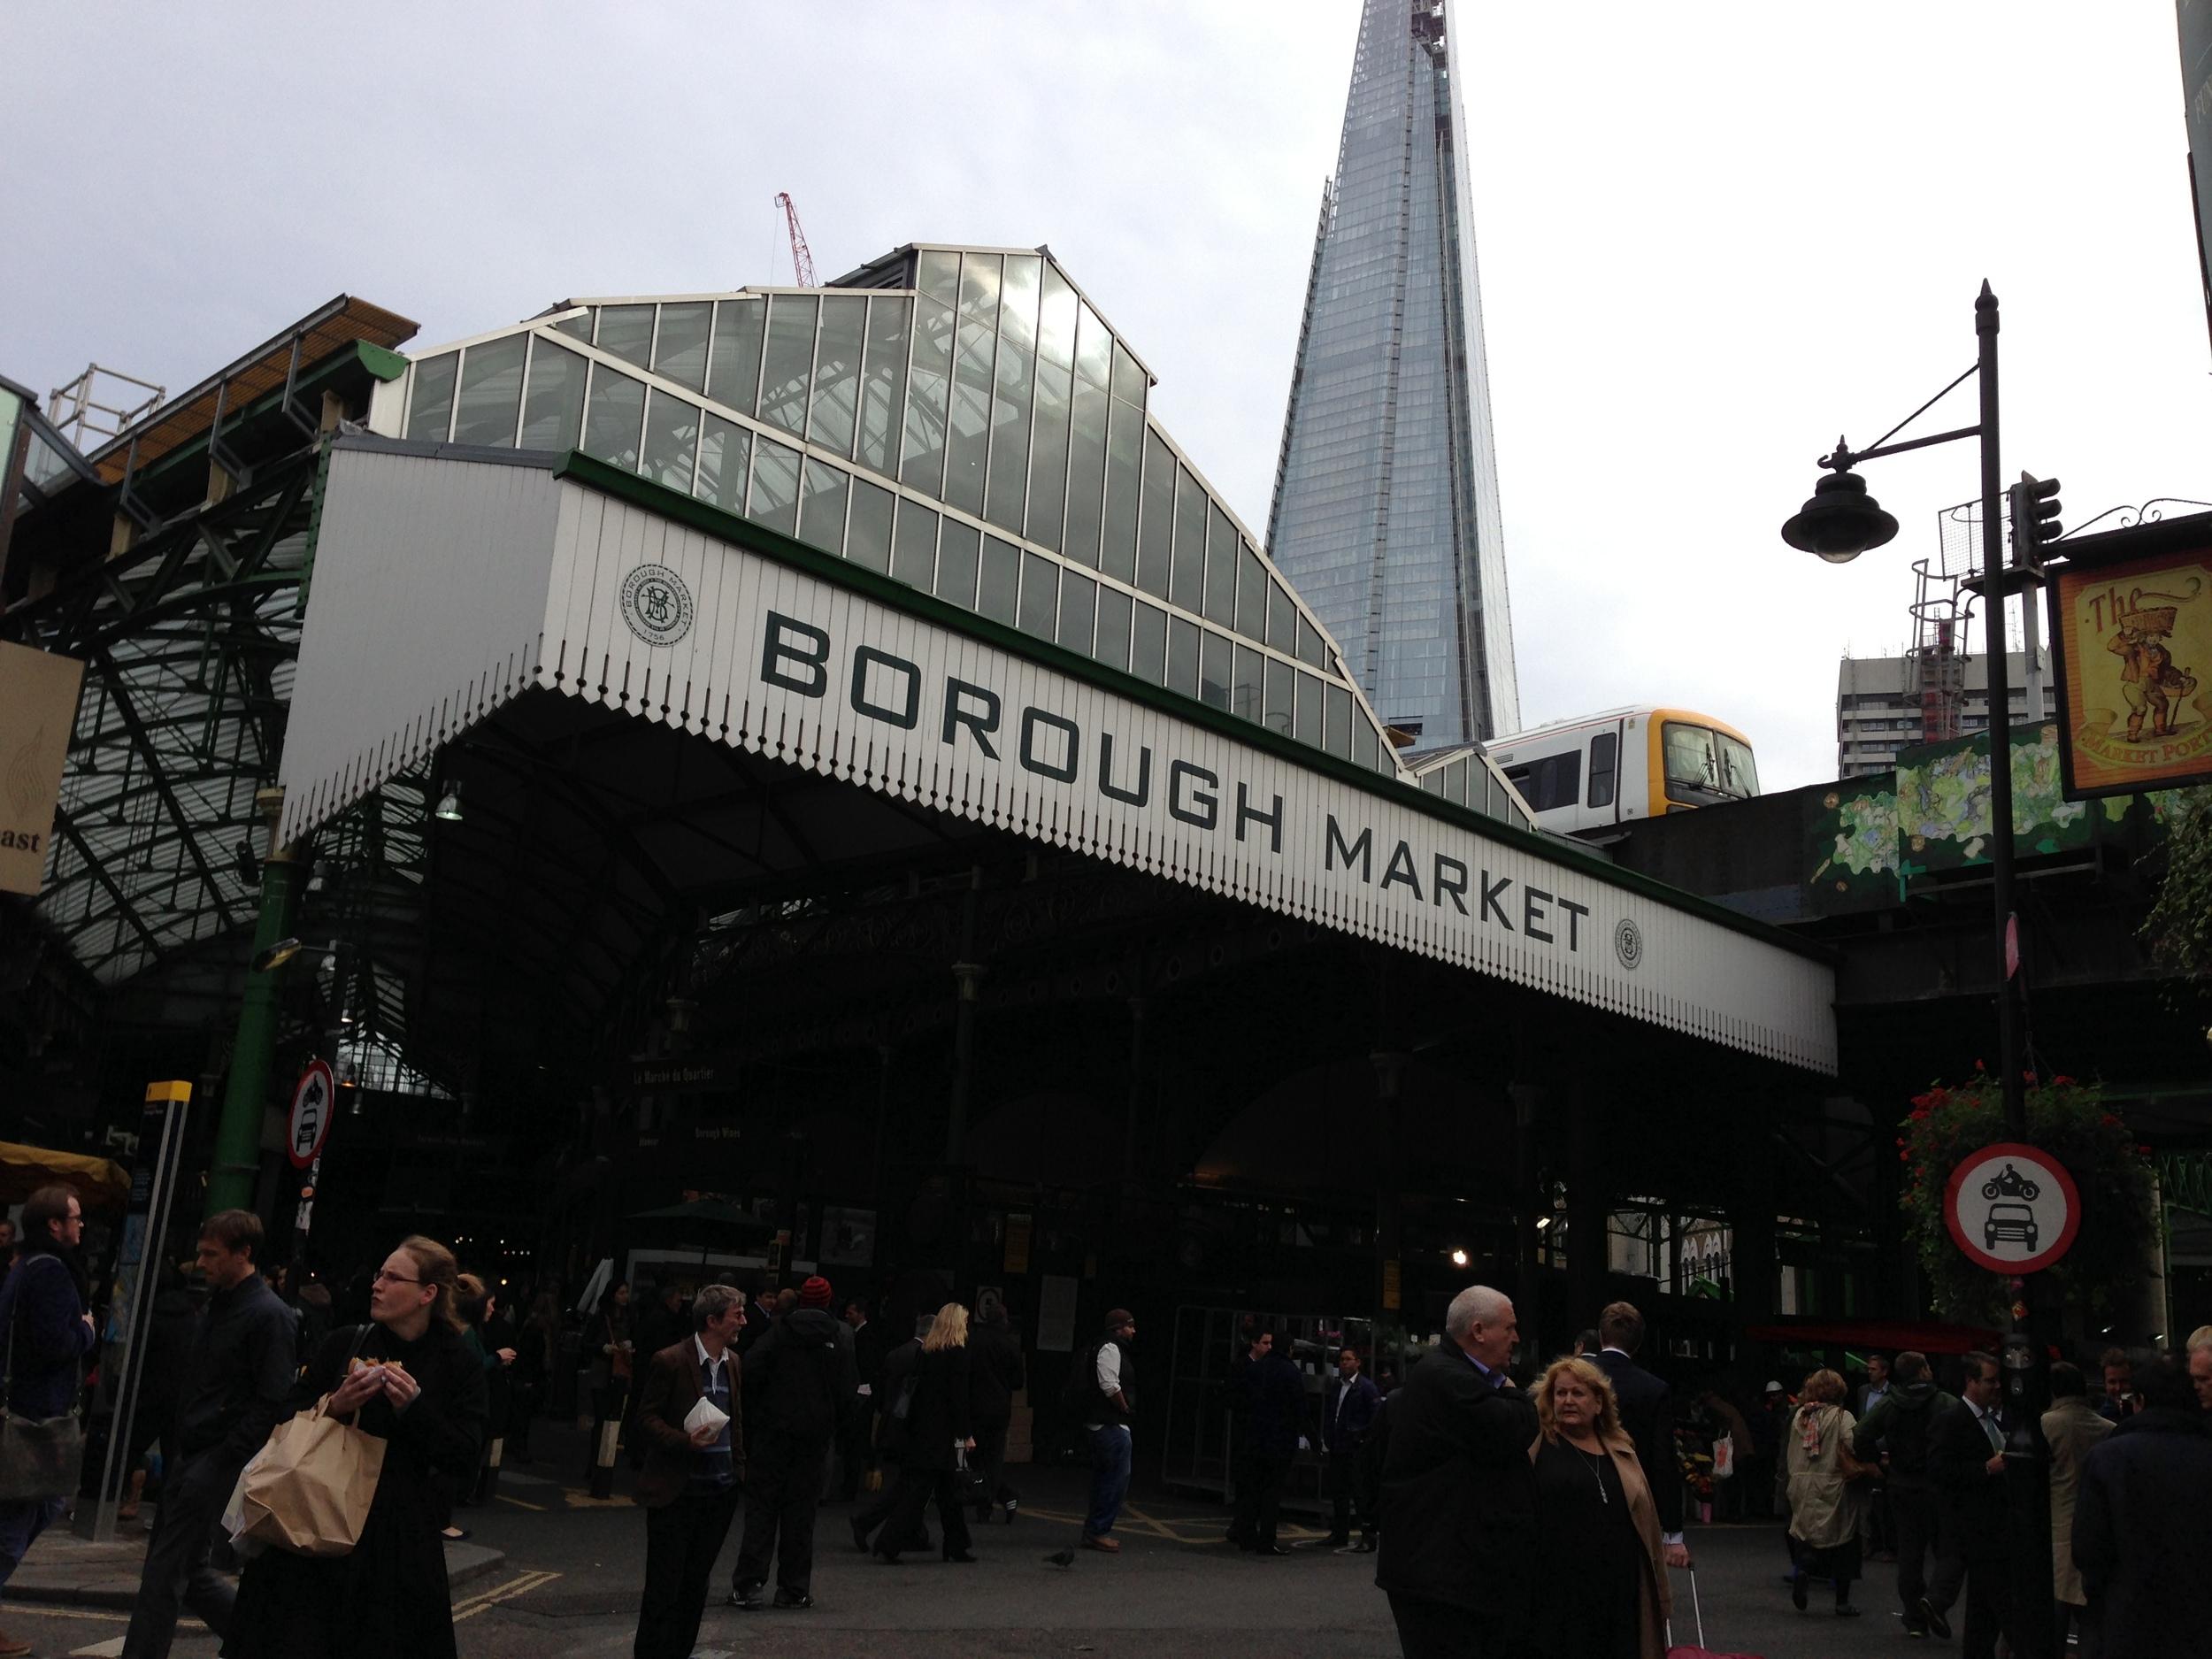 Borough Market London, England